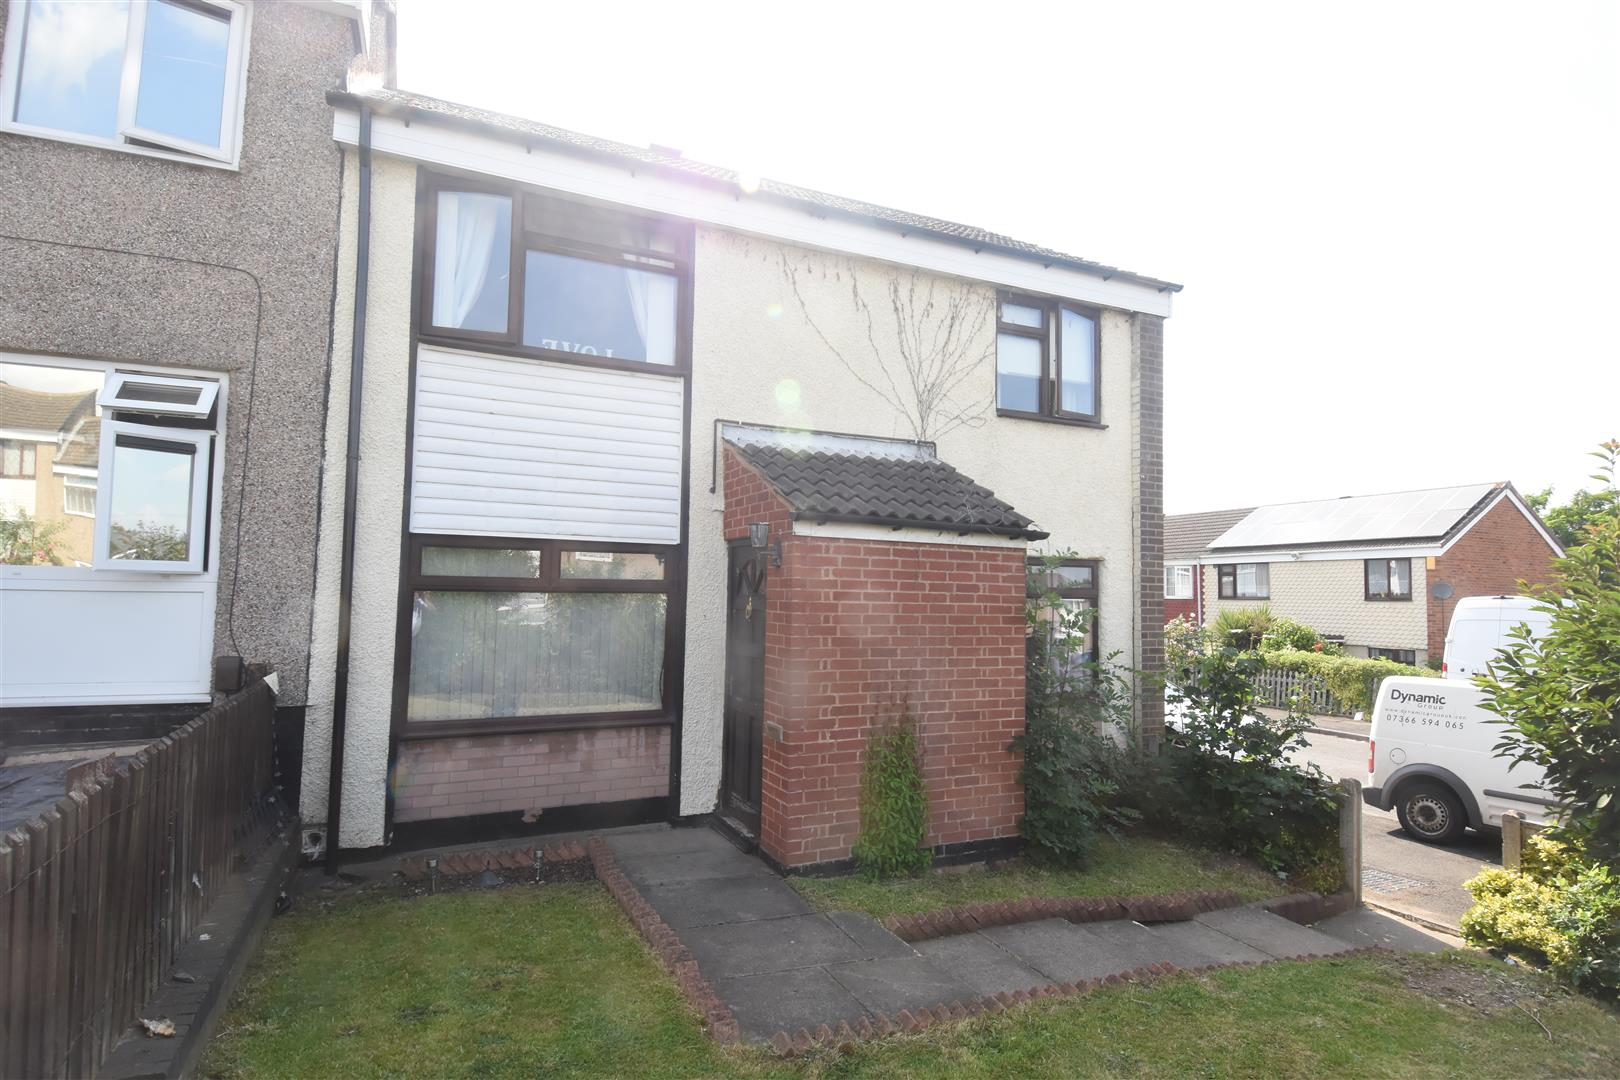 3 bed house for sale in Asholme Close, Bromford Bridge, Birmingham - Property Image 1